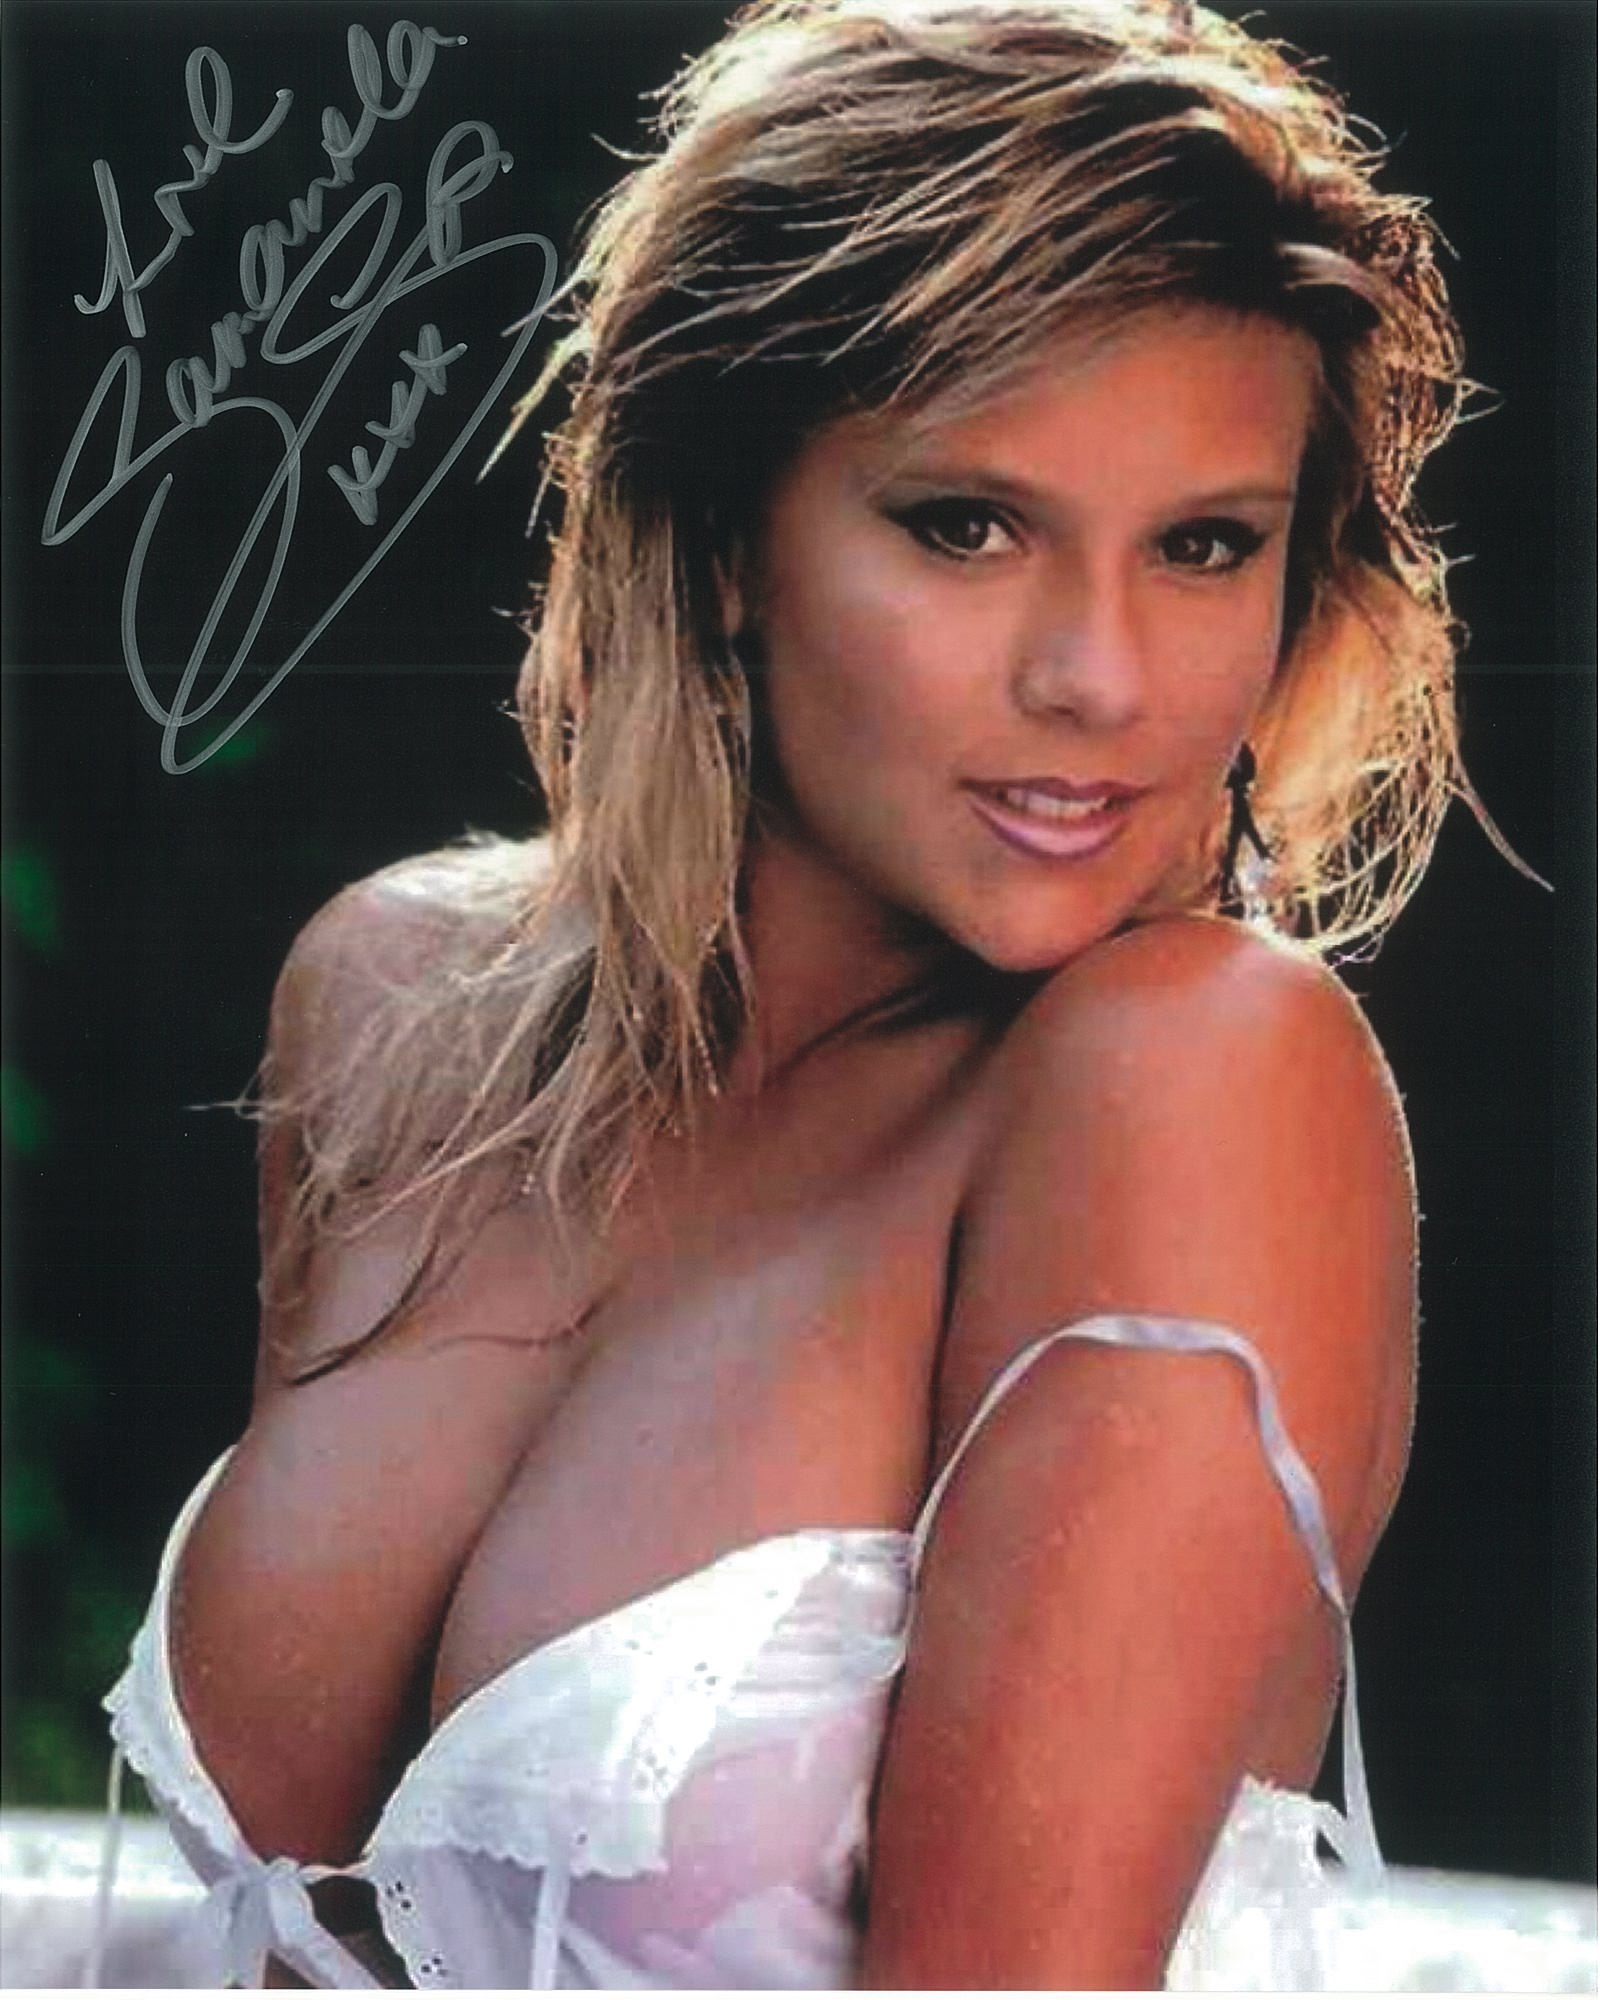 Samantha Fox Model Singer - Genuine Signed Autograph 8288